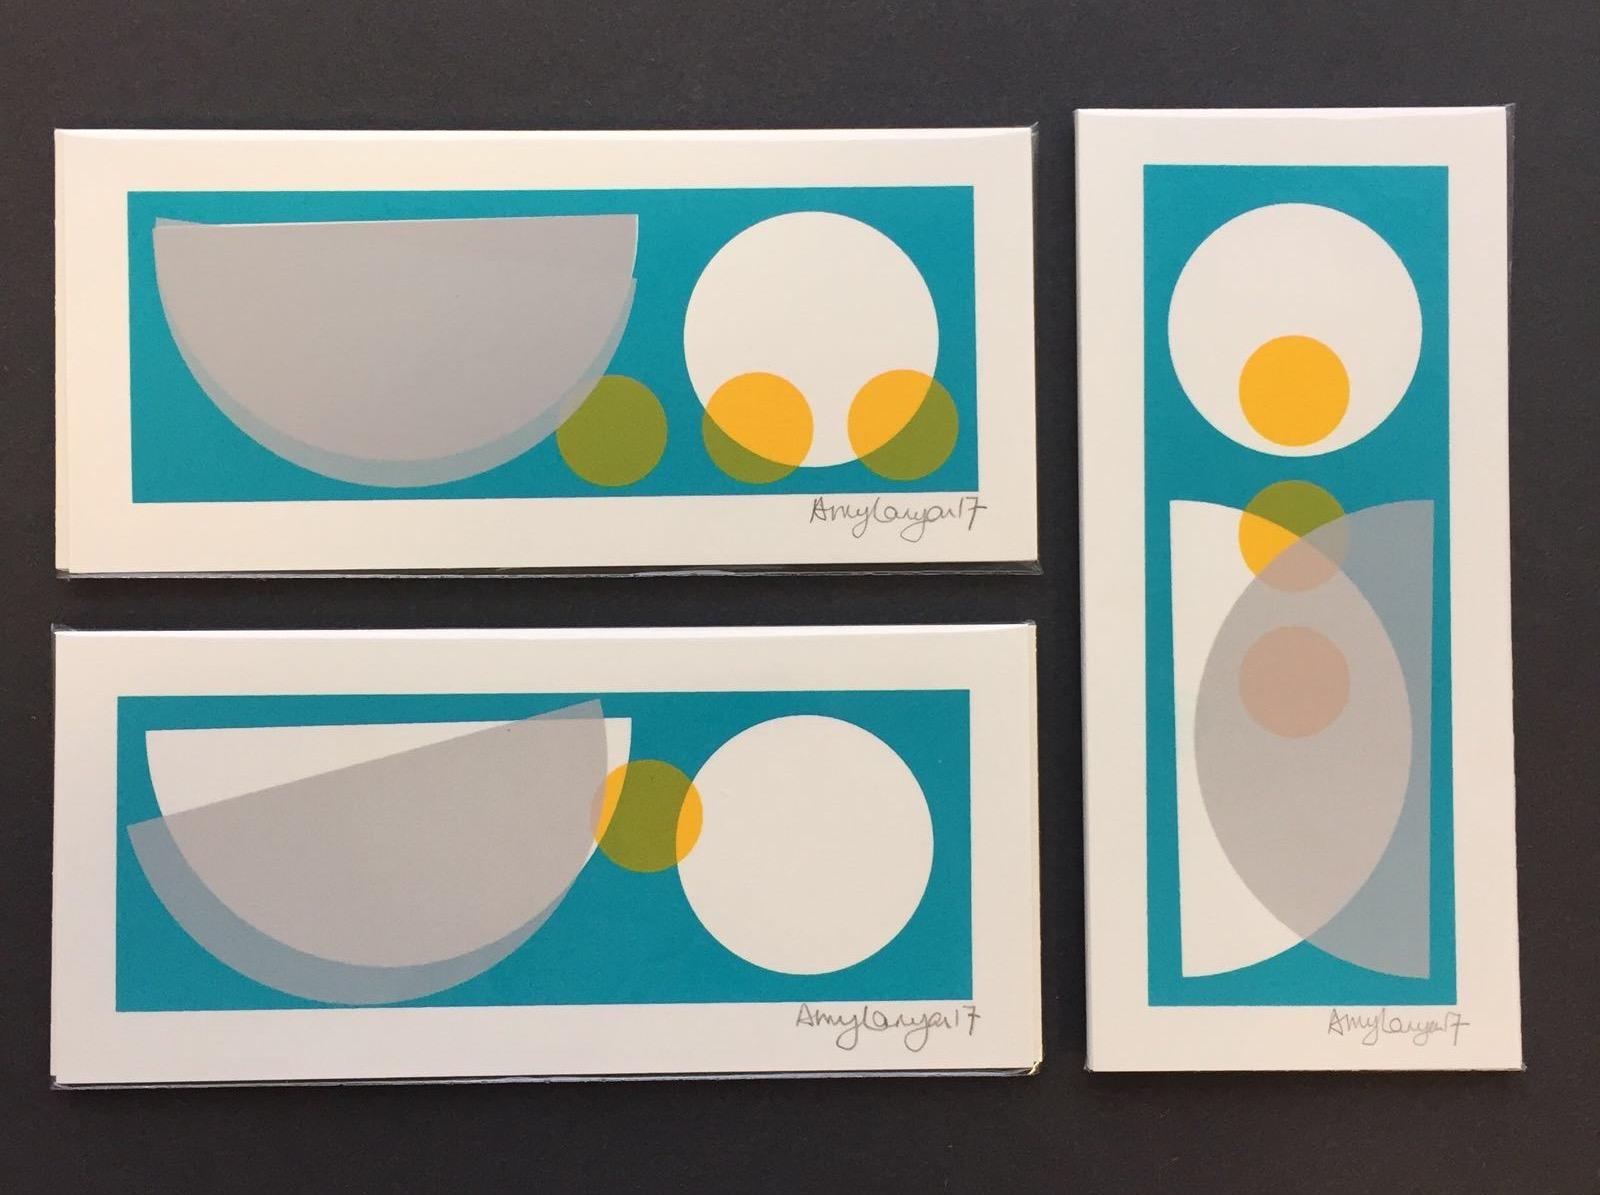 Original, one off screen prints. 9cm x 19.5cm.